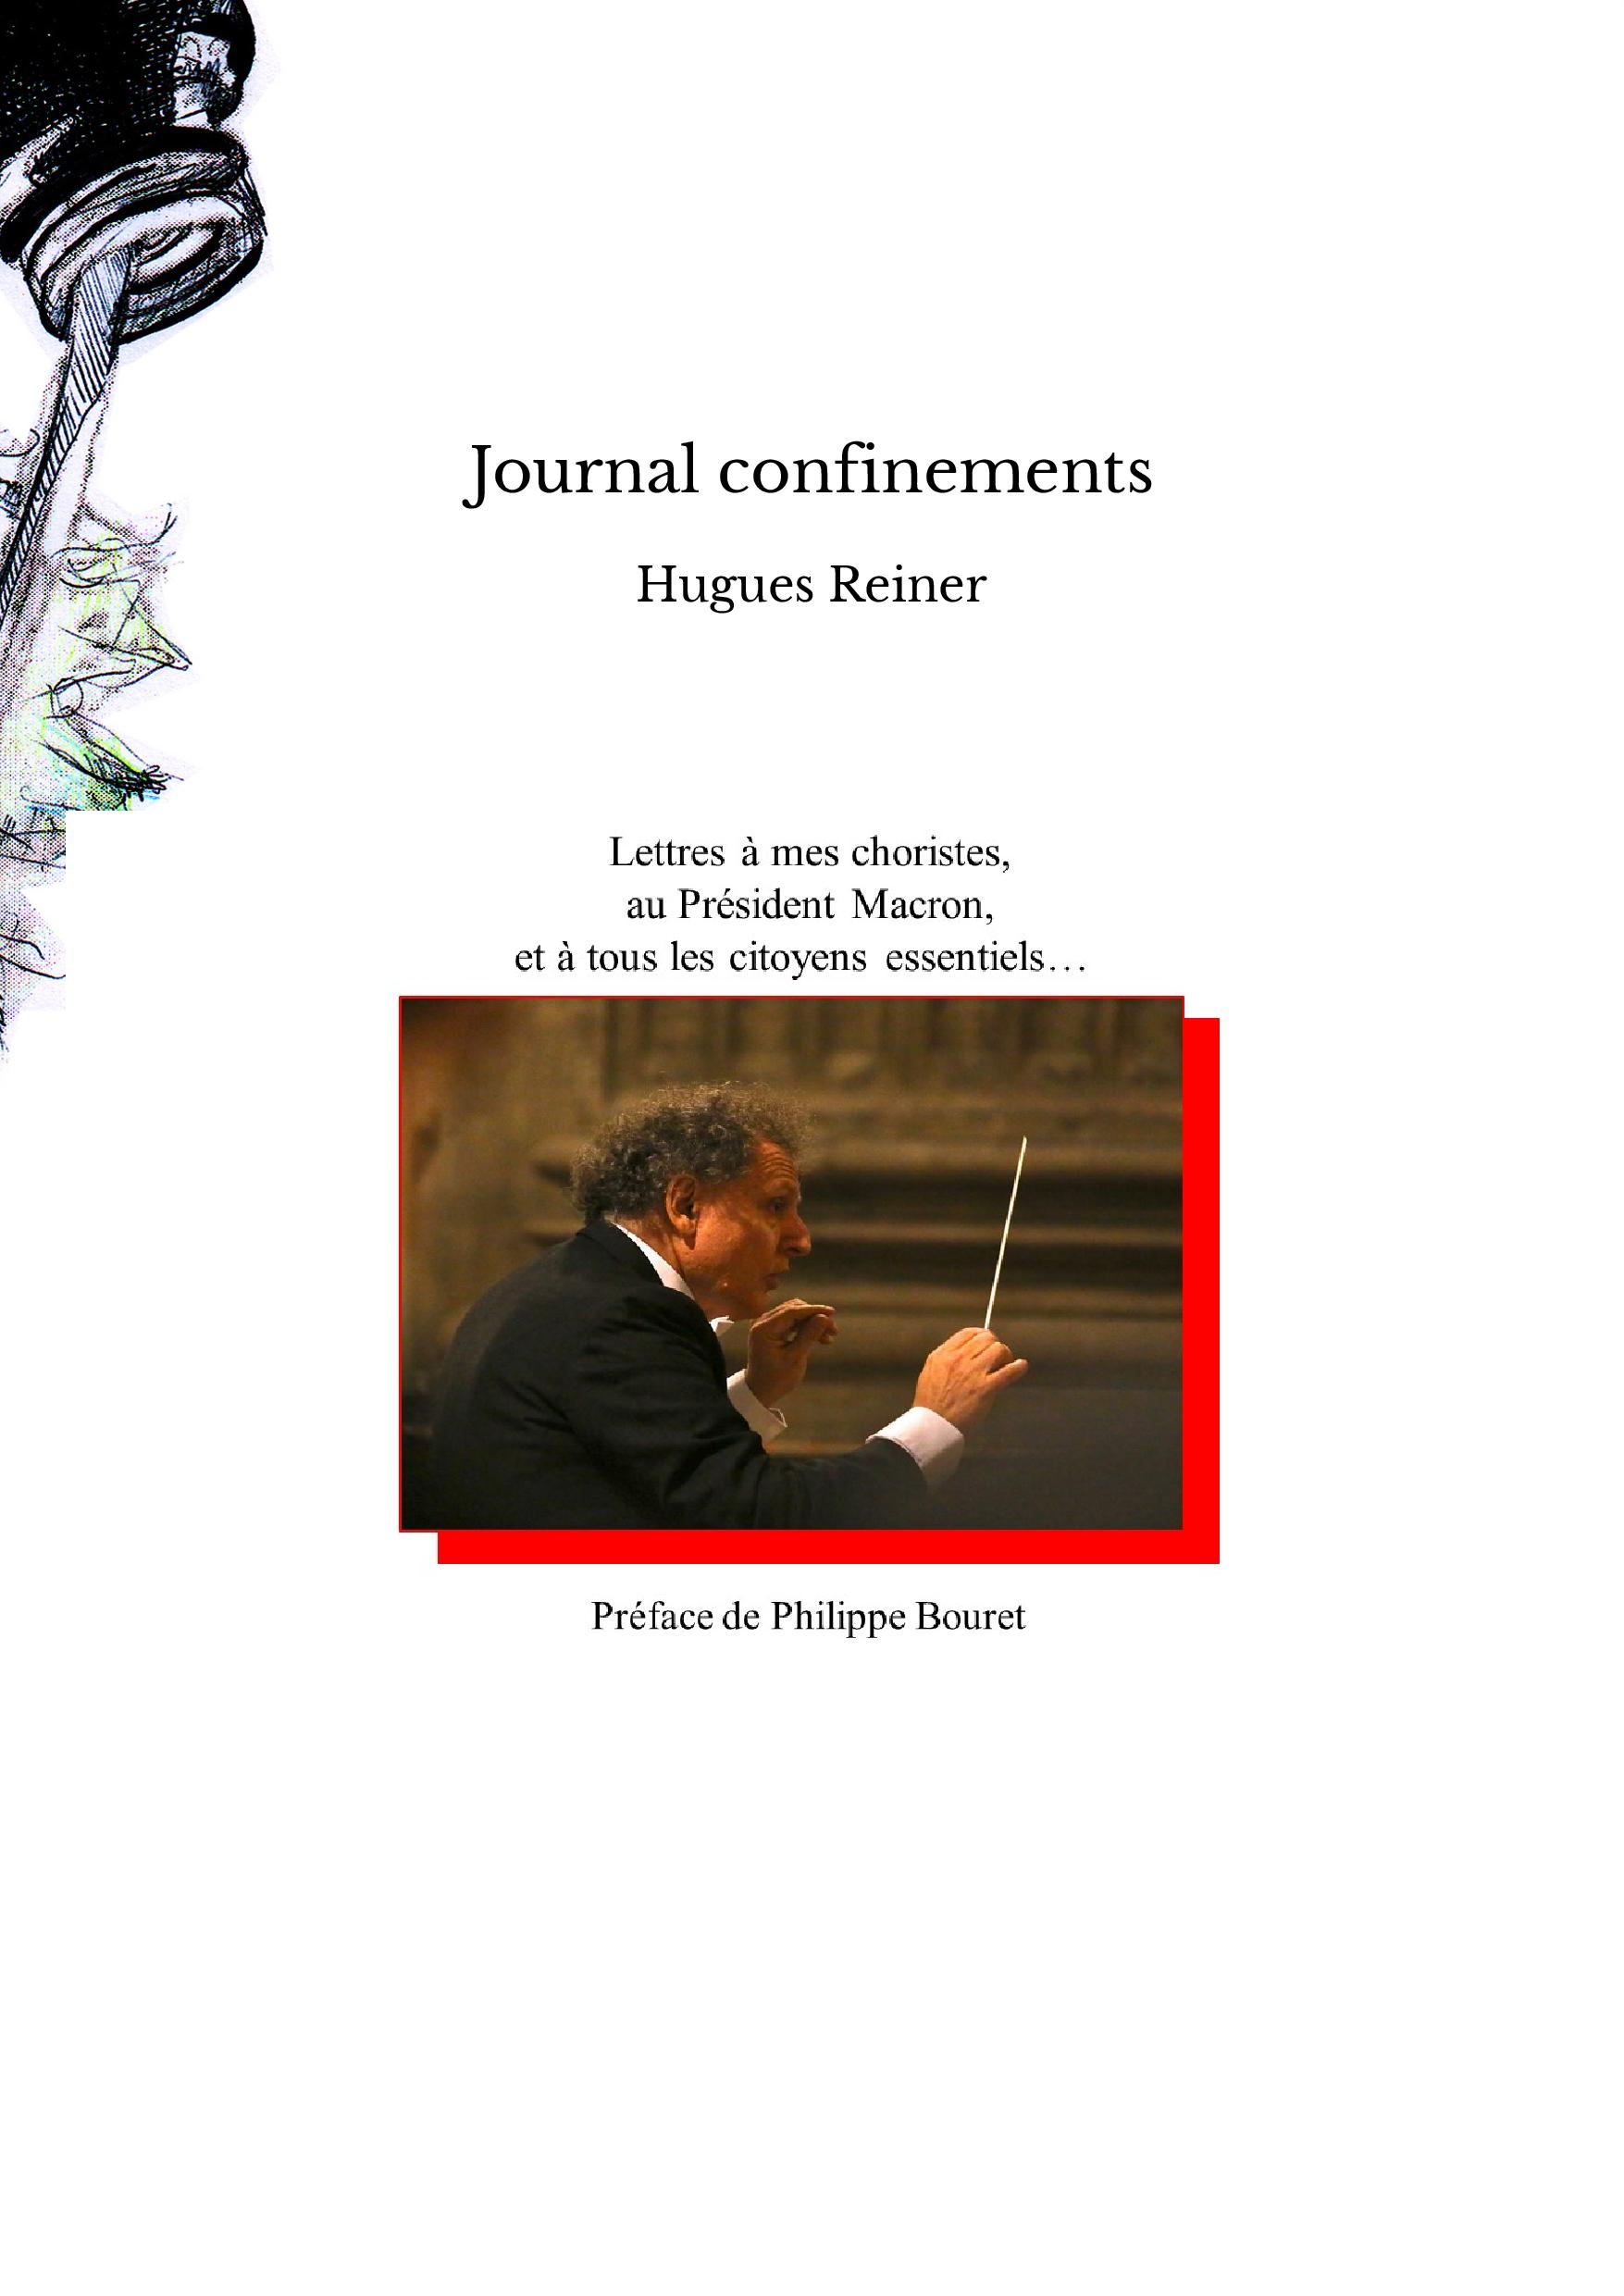 Journal confinements